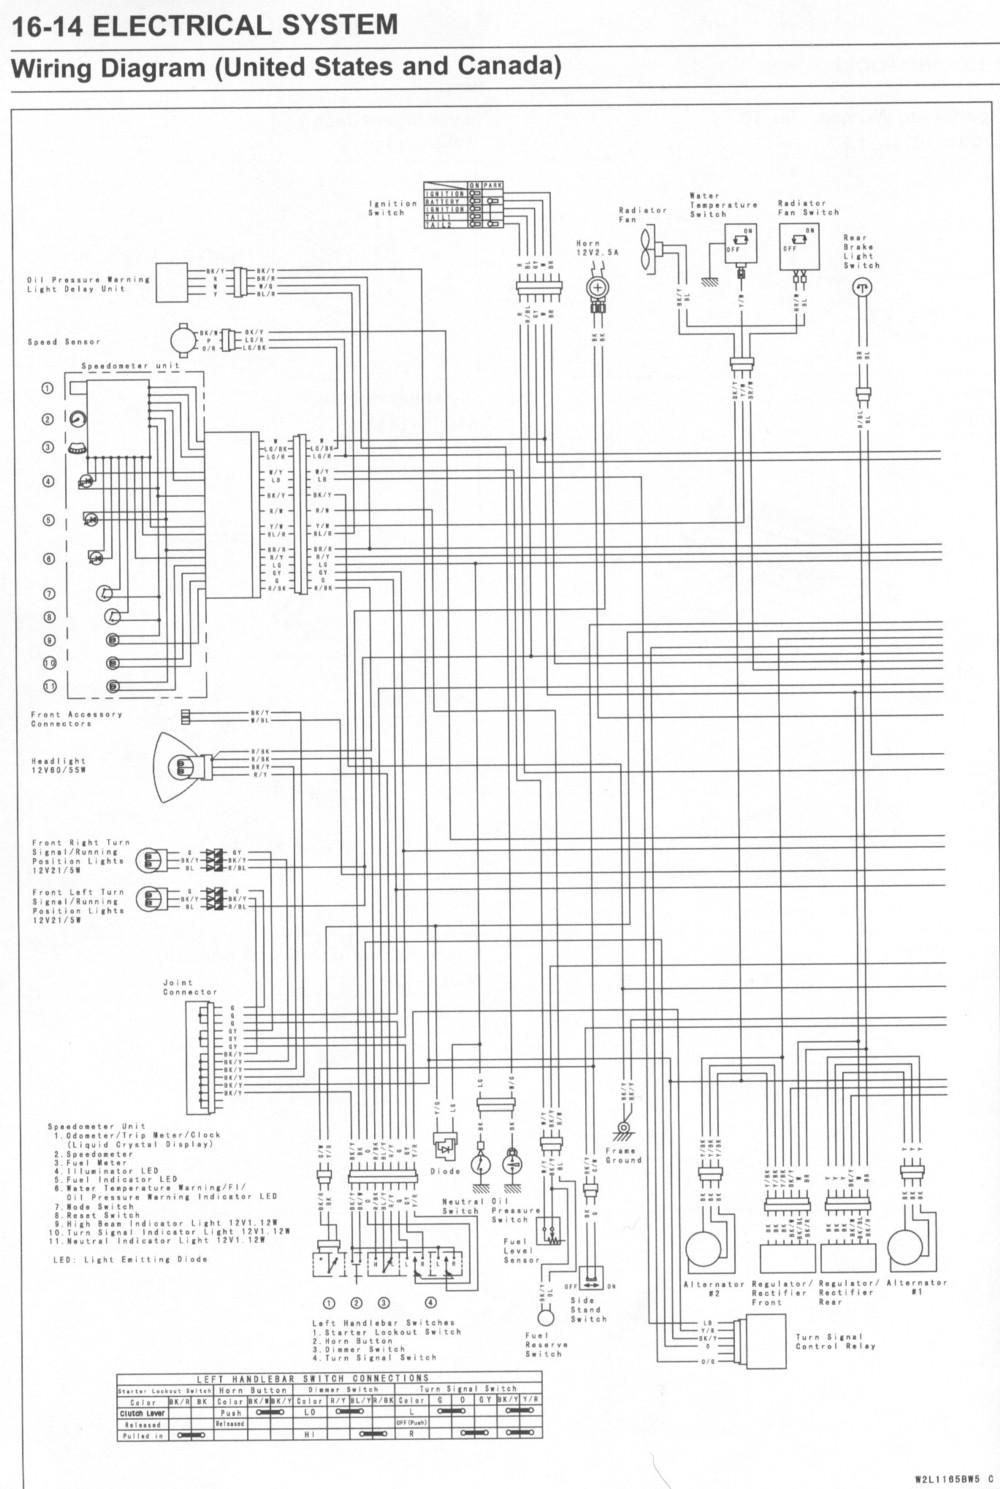 Diagram  1999 Kawasaki Zx7 Wiring Diagram Full Version Hd Quality Wiring Diagram